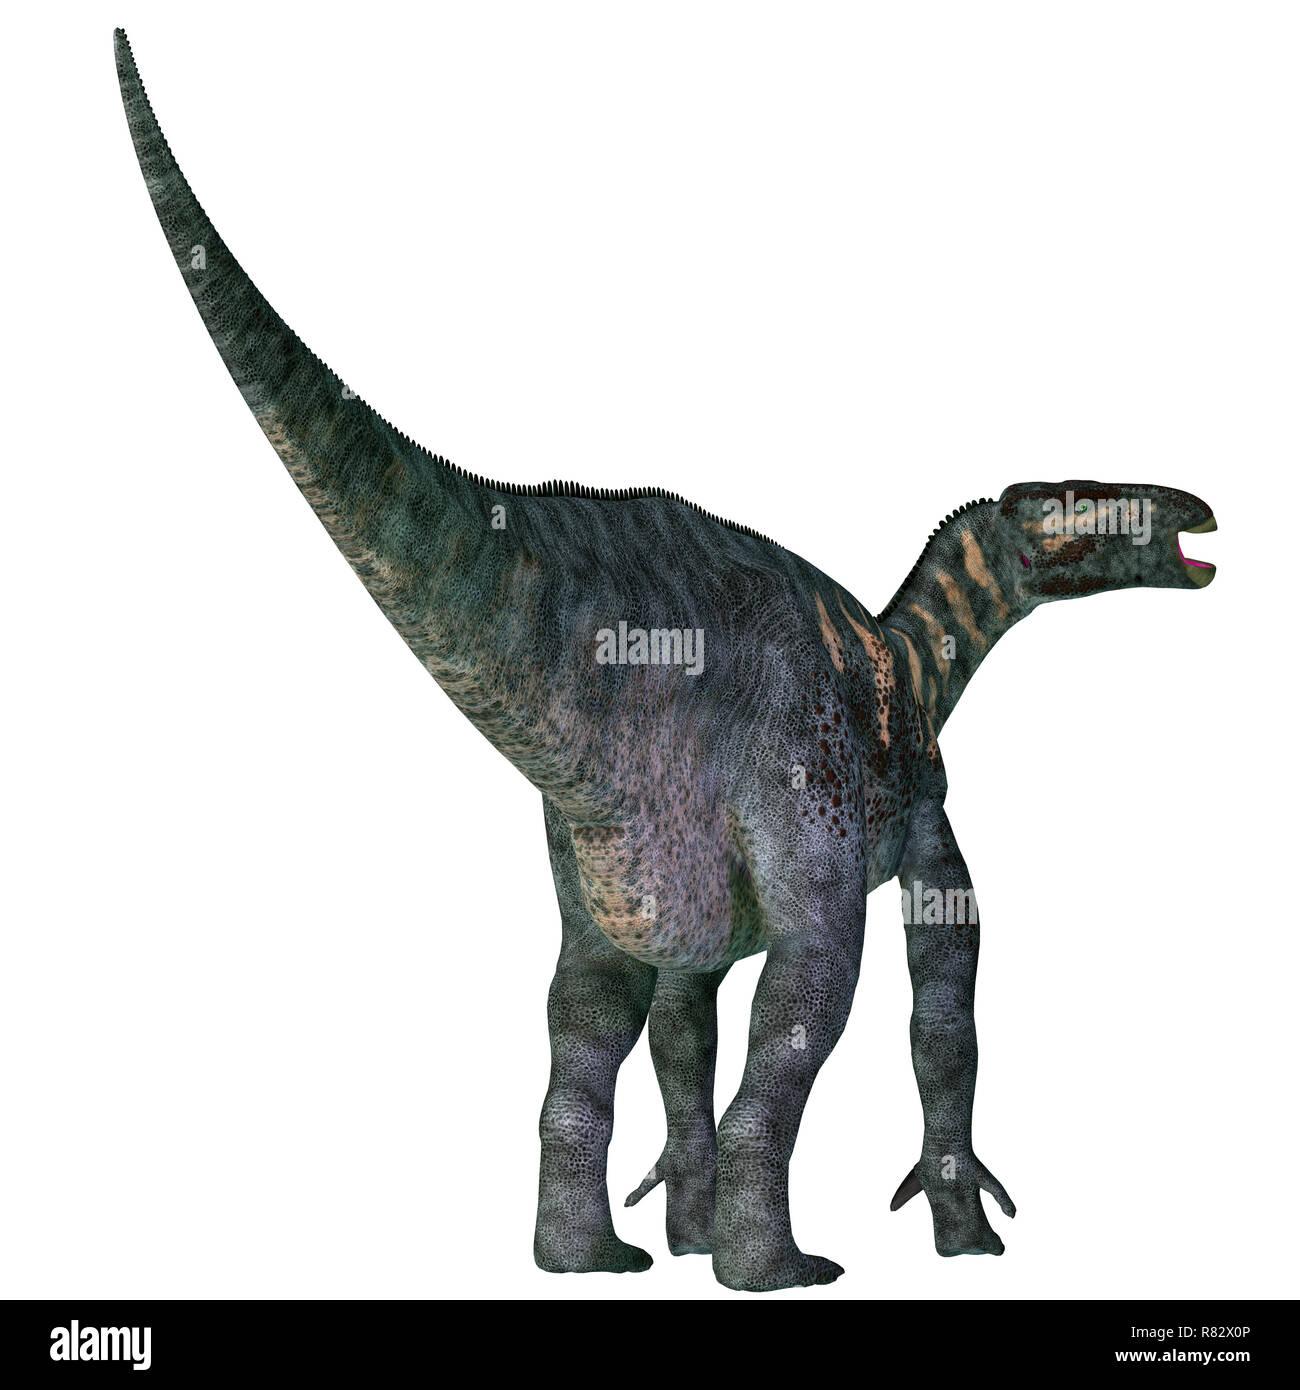 Iguanodon Dinosaur Tail - Iguanodon was a herbivorous ornithopod dinosaur that lived in Europe during the Cretaceous Period. - Stock Image